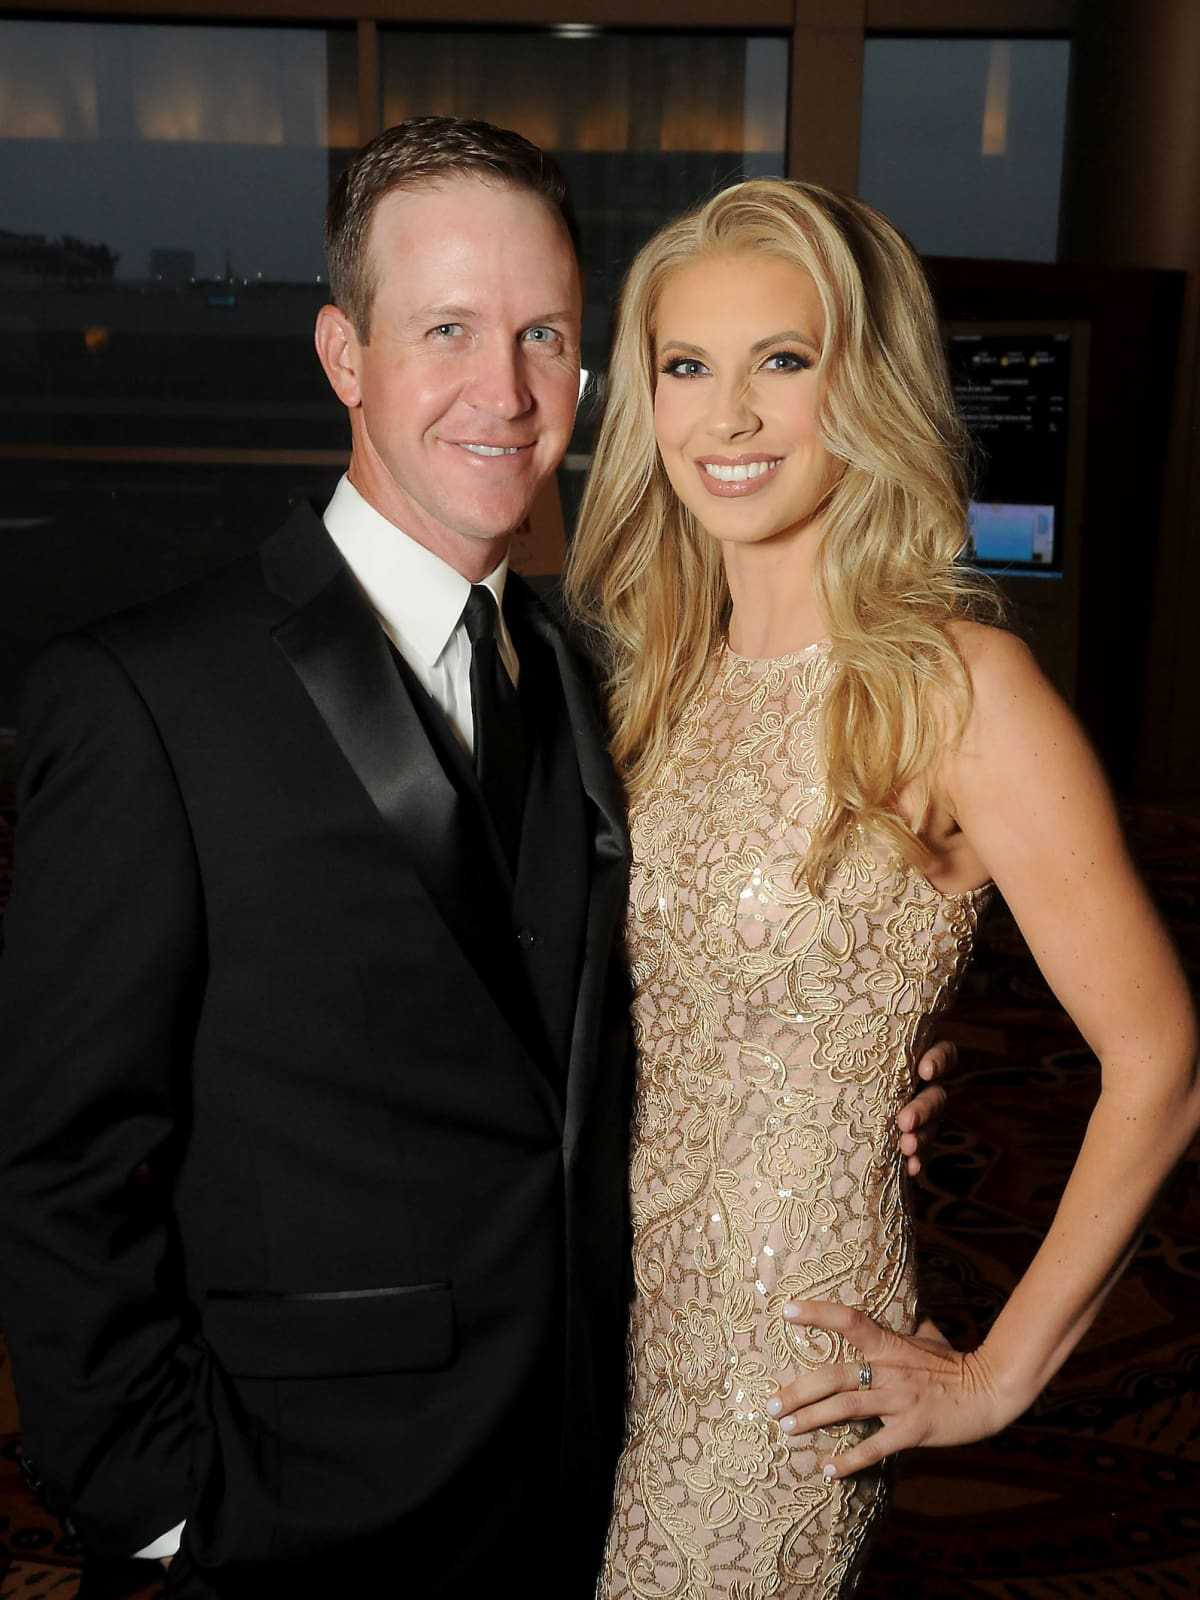 Bud Lyon and Kim Colvin at Memorial Hermann Gala